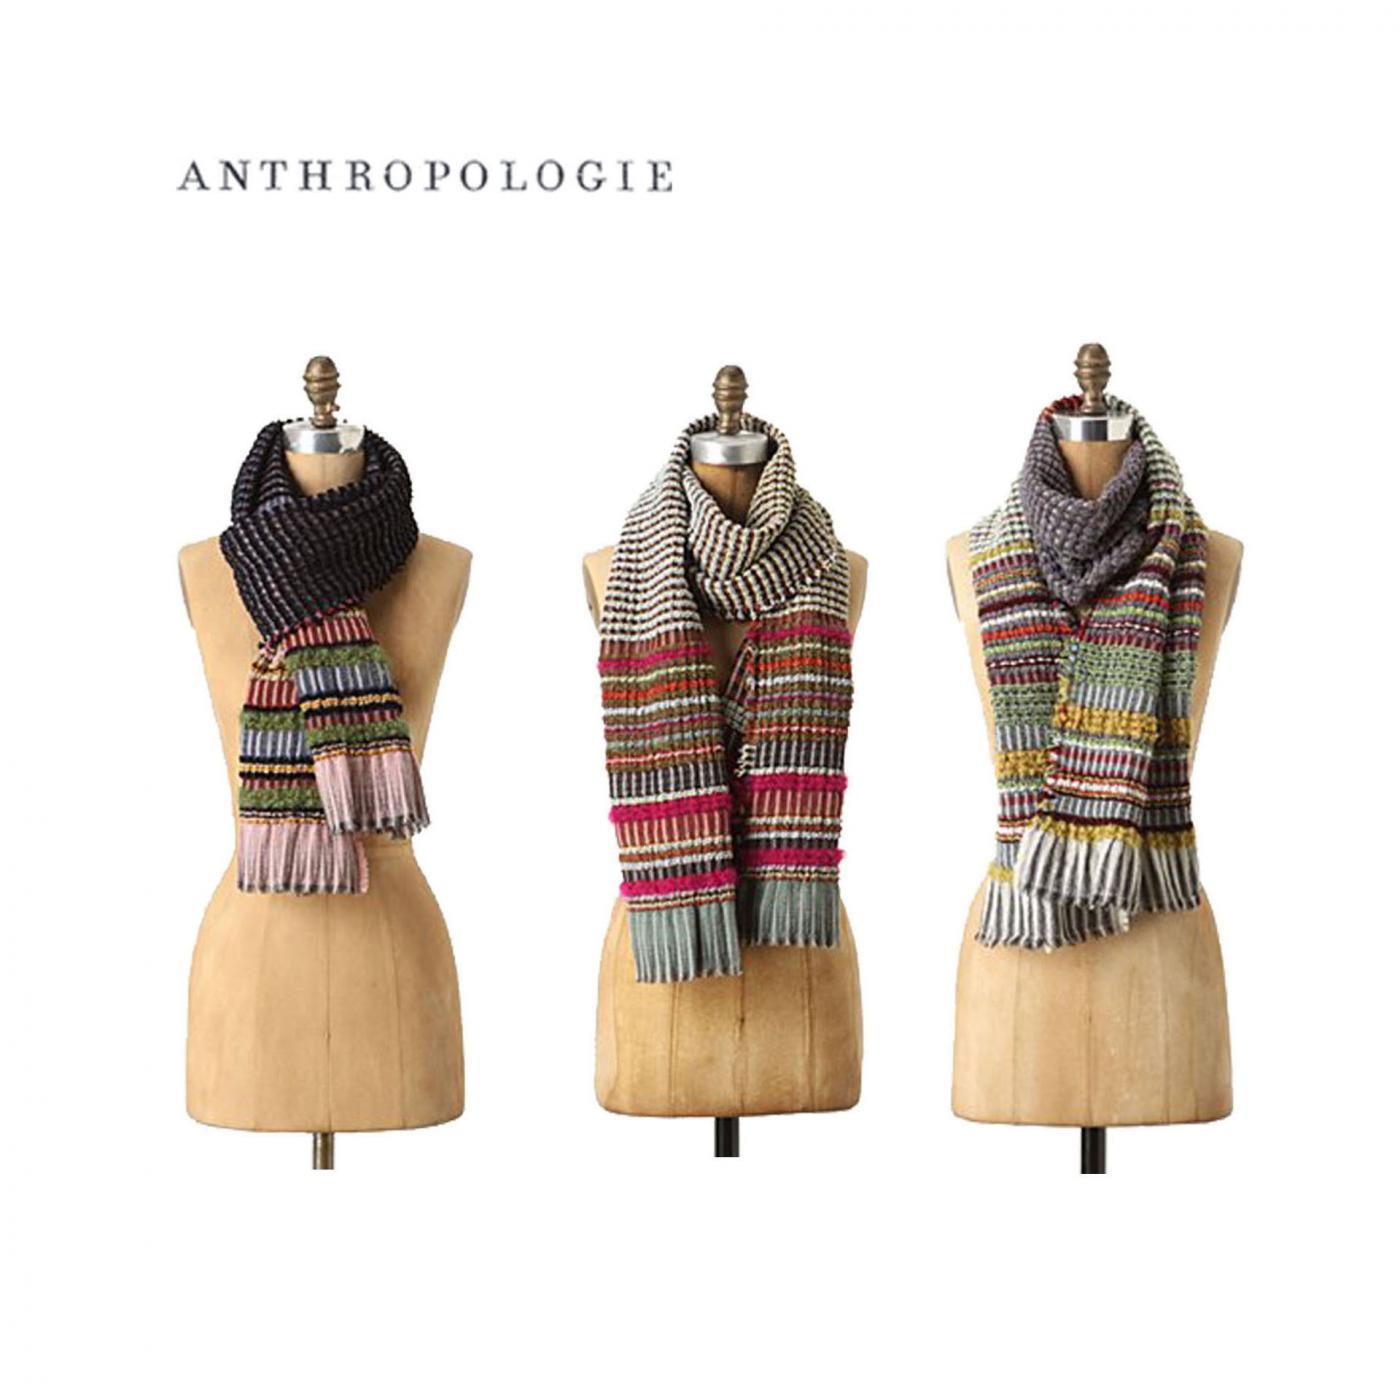 Anthropologie – Chenille wraps